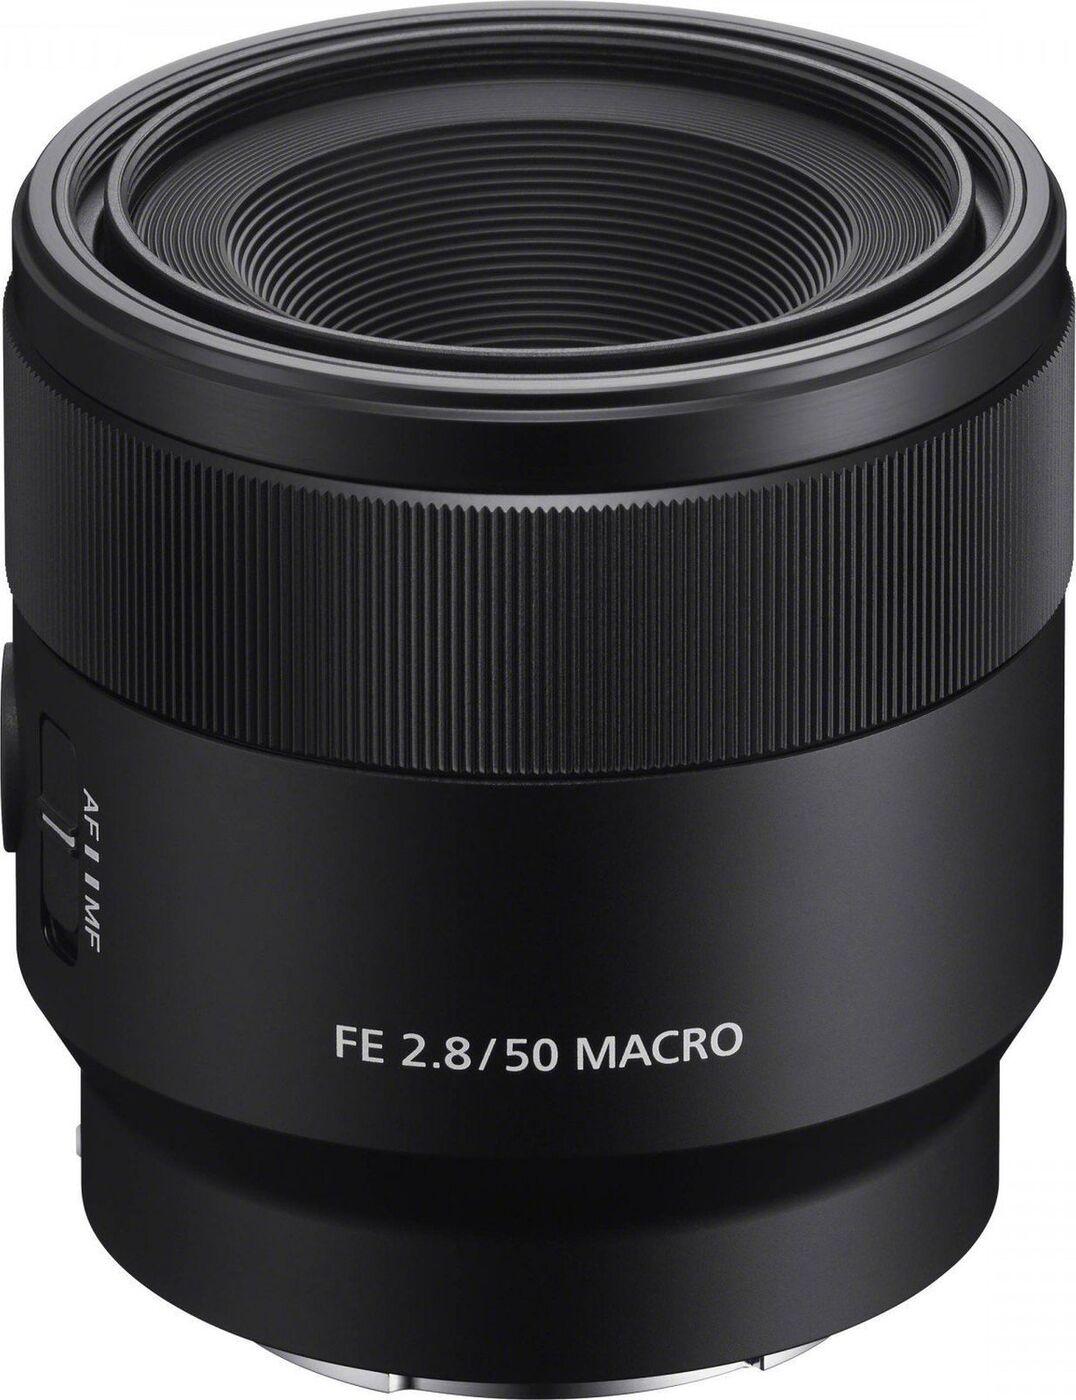 Объектив Sony FE 50mm F2.8 Macro, черный